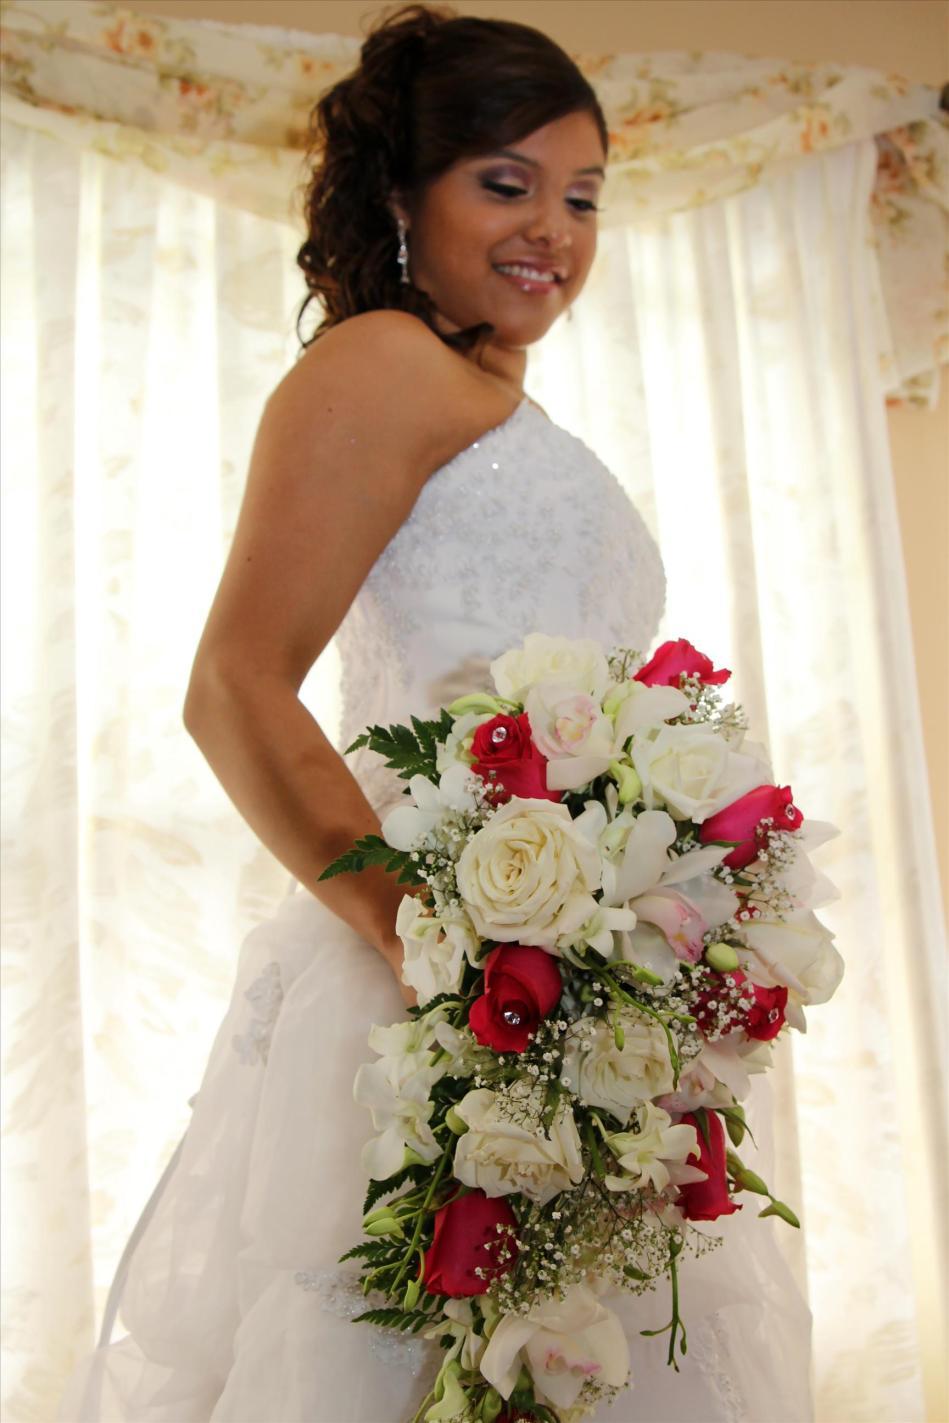 bridebouquet.bridalprep.weddingphotos.apicturesquememoryphotography